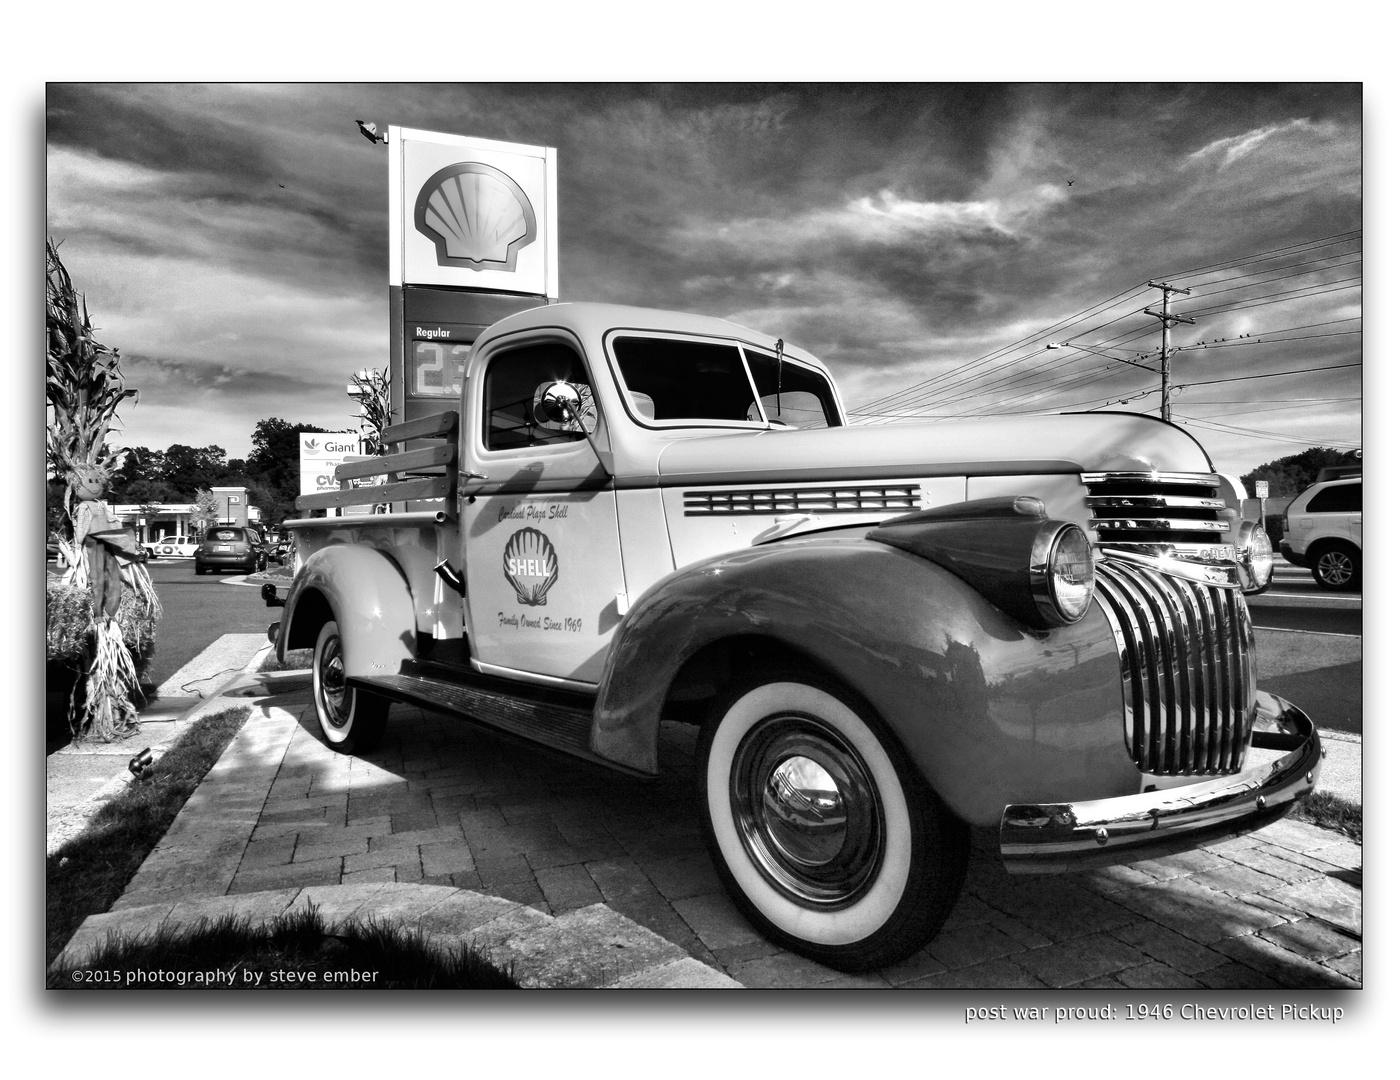 Post-War Proud: 1946 Chevrolet Pickup